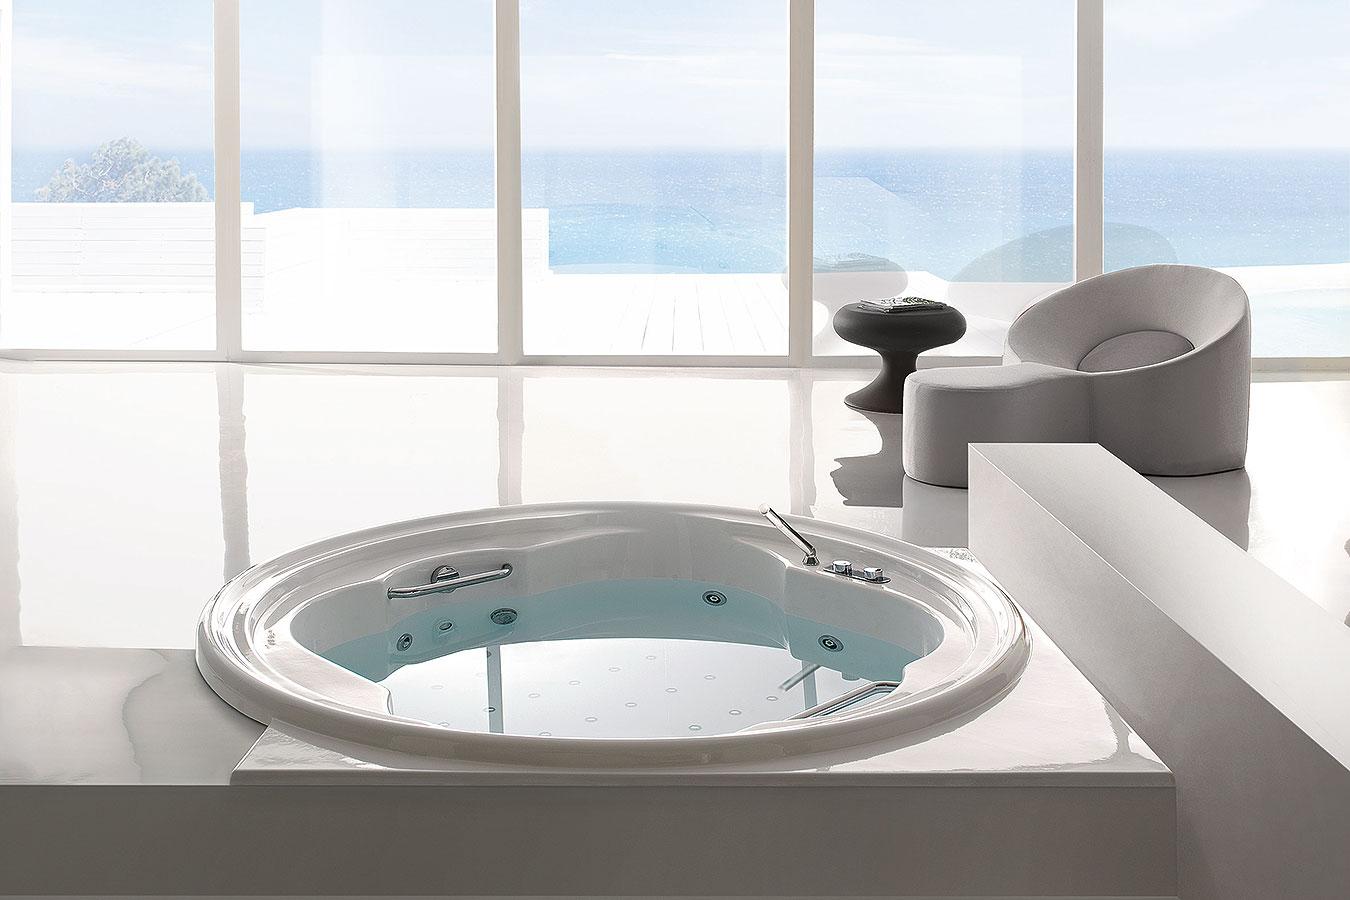 Misura Vasca Da Bagno: Vasca da bagno su misura in corian andreoli. Misure vasca da bagno ...